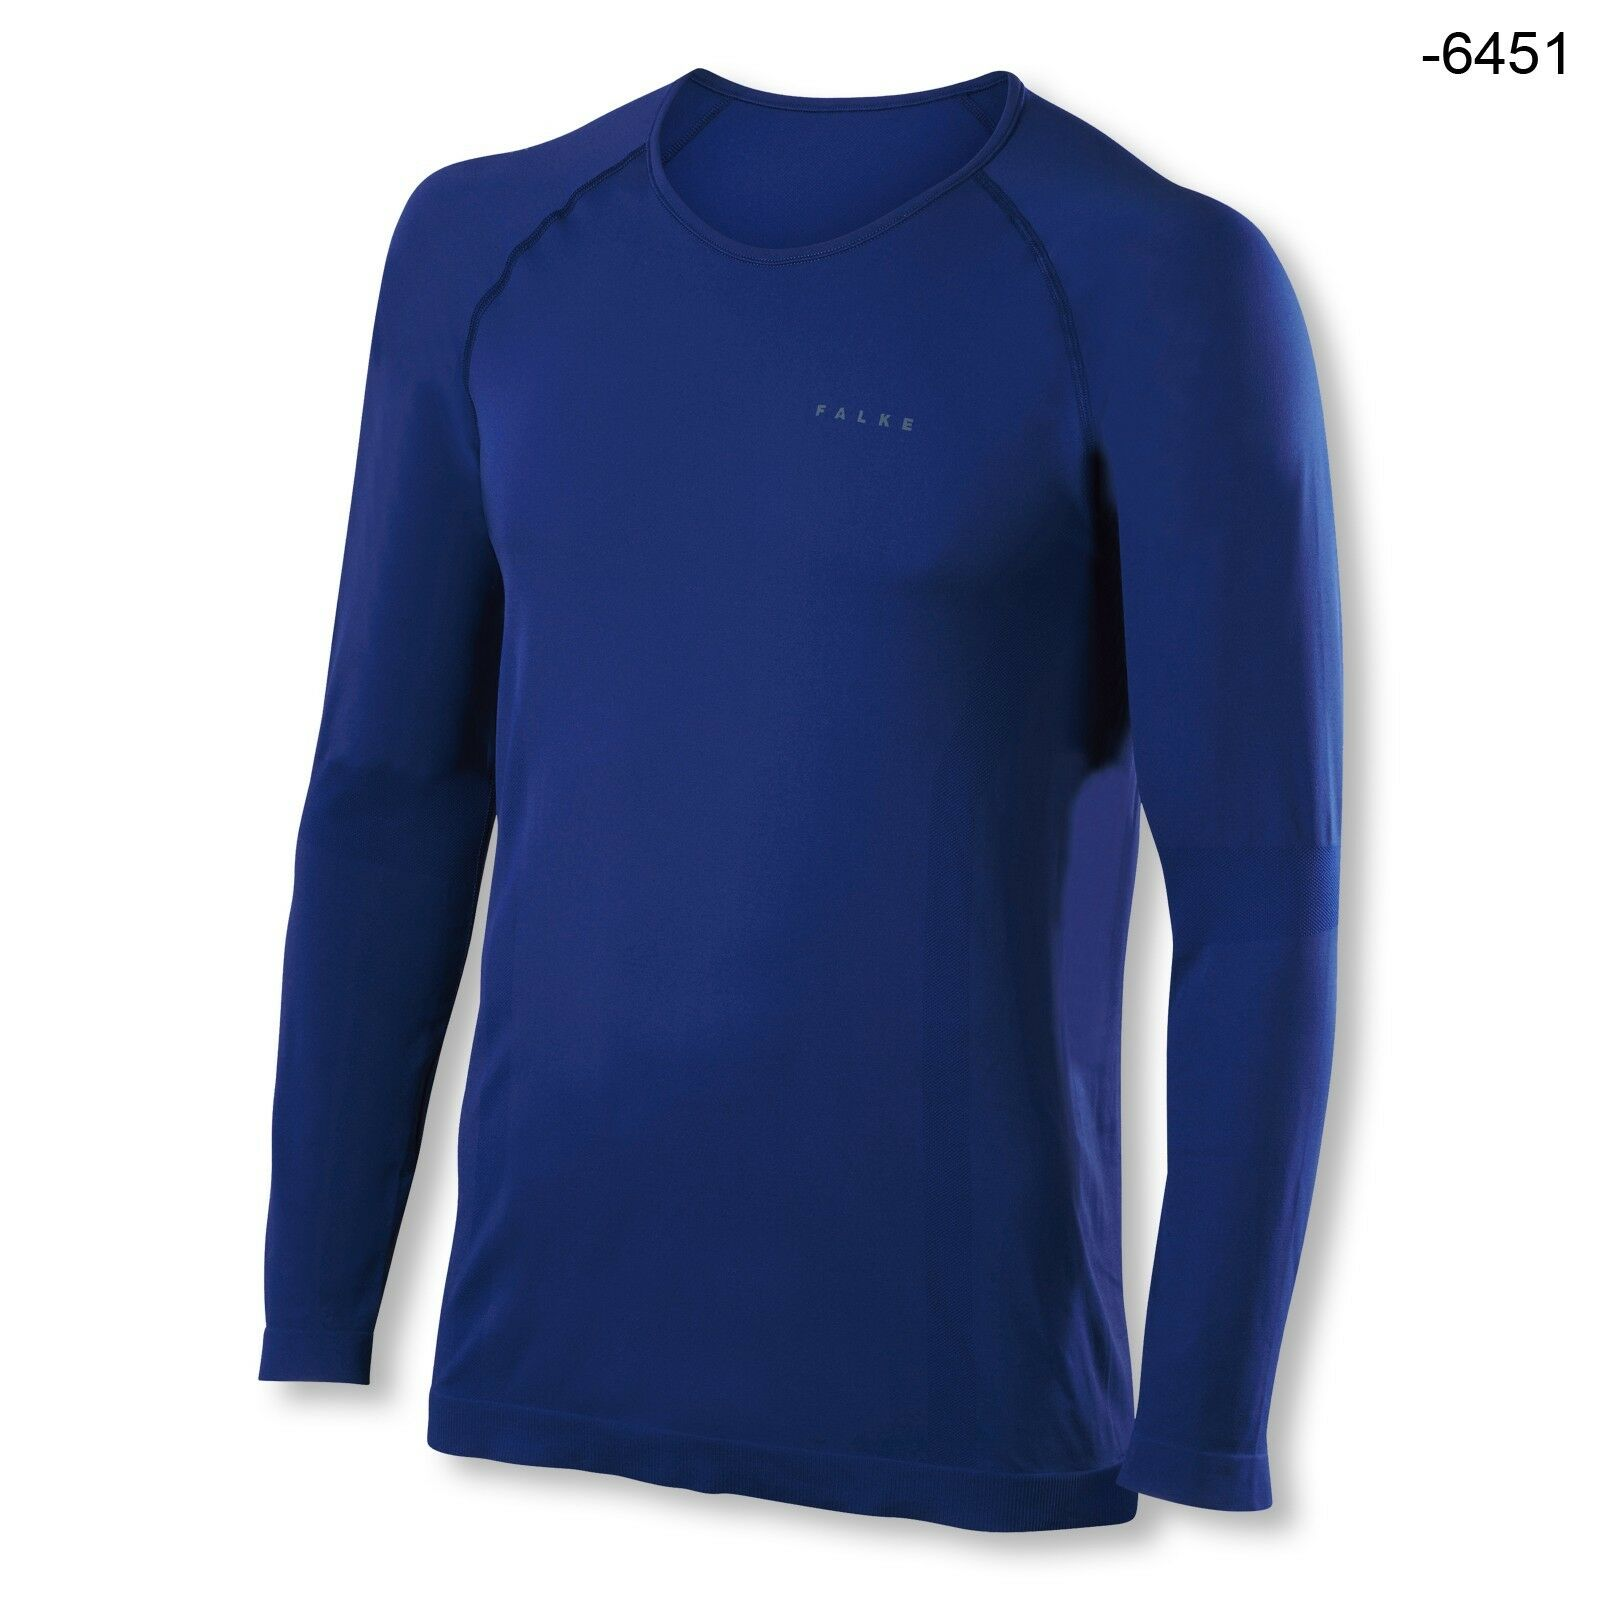 Falke Herren Funktionsshirt Langarmshirt Comfort Unterhemden Comfort Langarmshirt Fit Warm Farbwahl 96816b